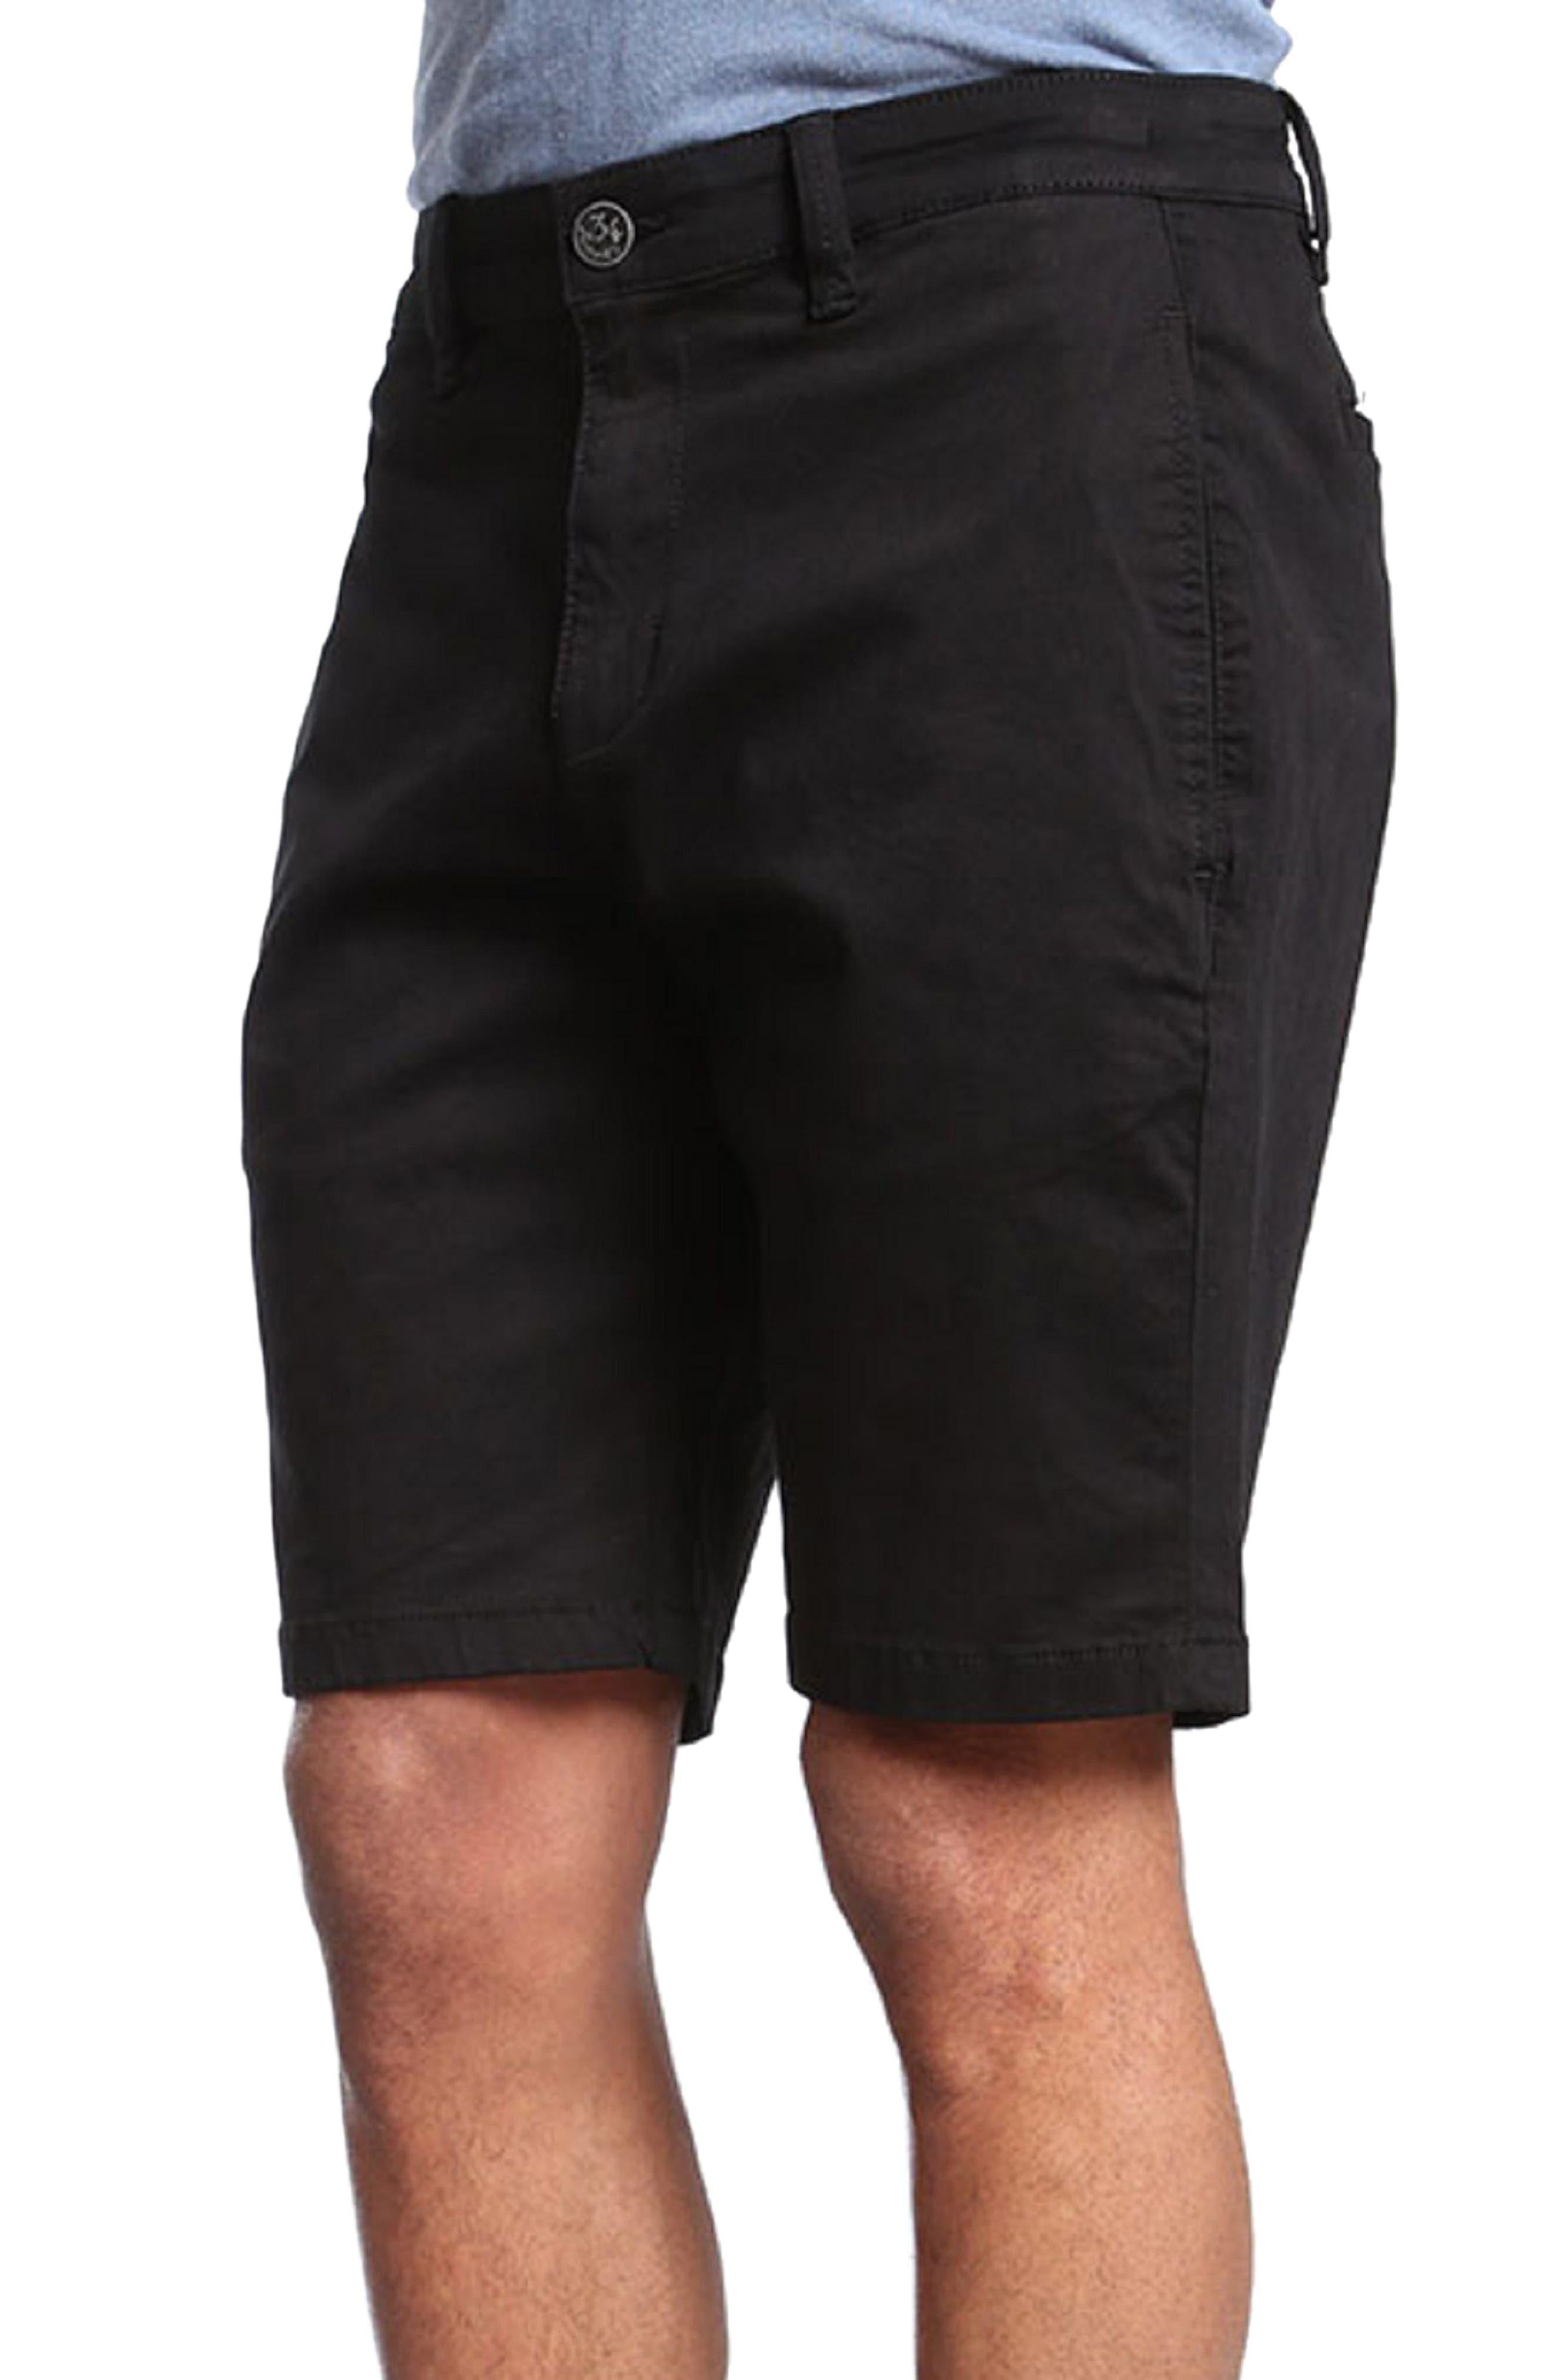 Nevada Twill Shorts,                         Main,                         color, BLACK TWILL